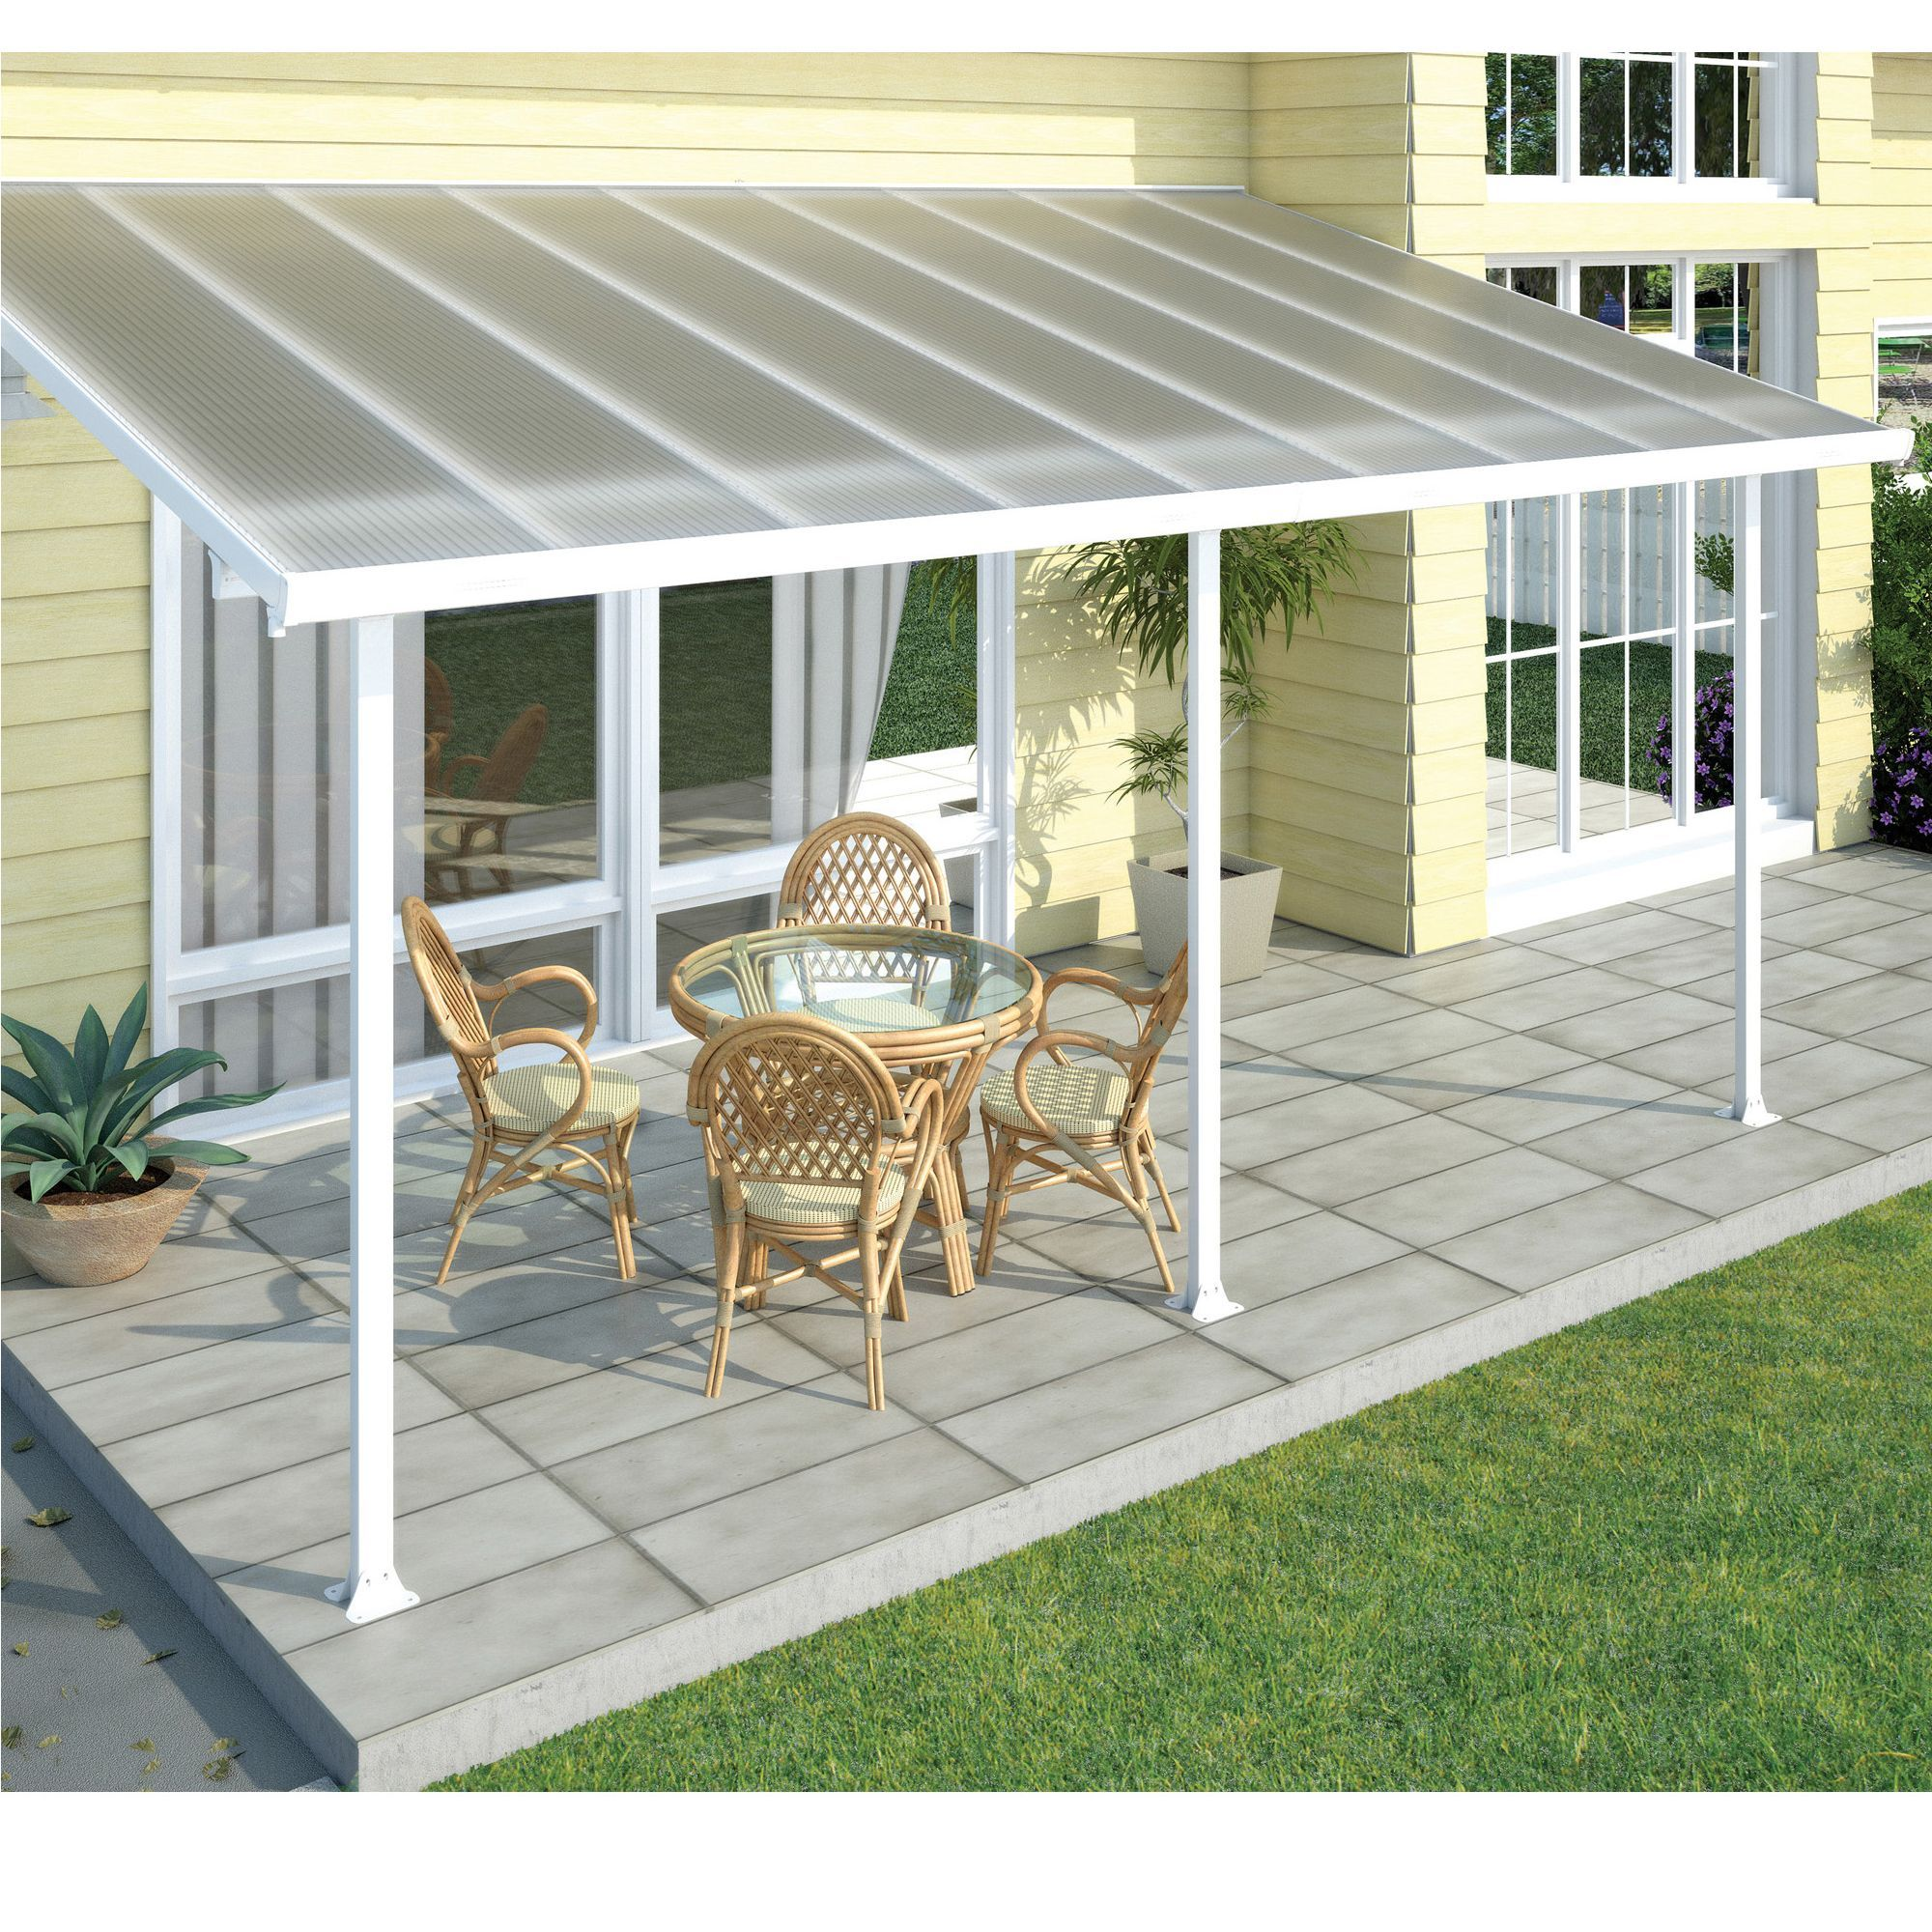 Toit De Protection Pour Terrasse 3x6m Blanc Pergola Les Pergolas